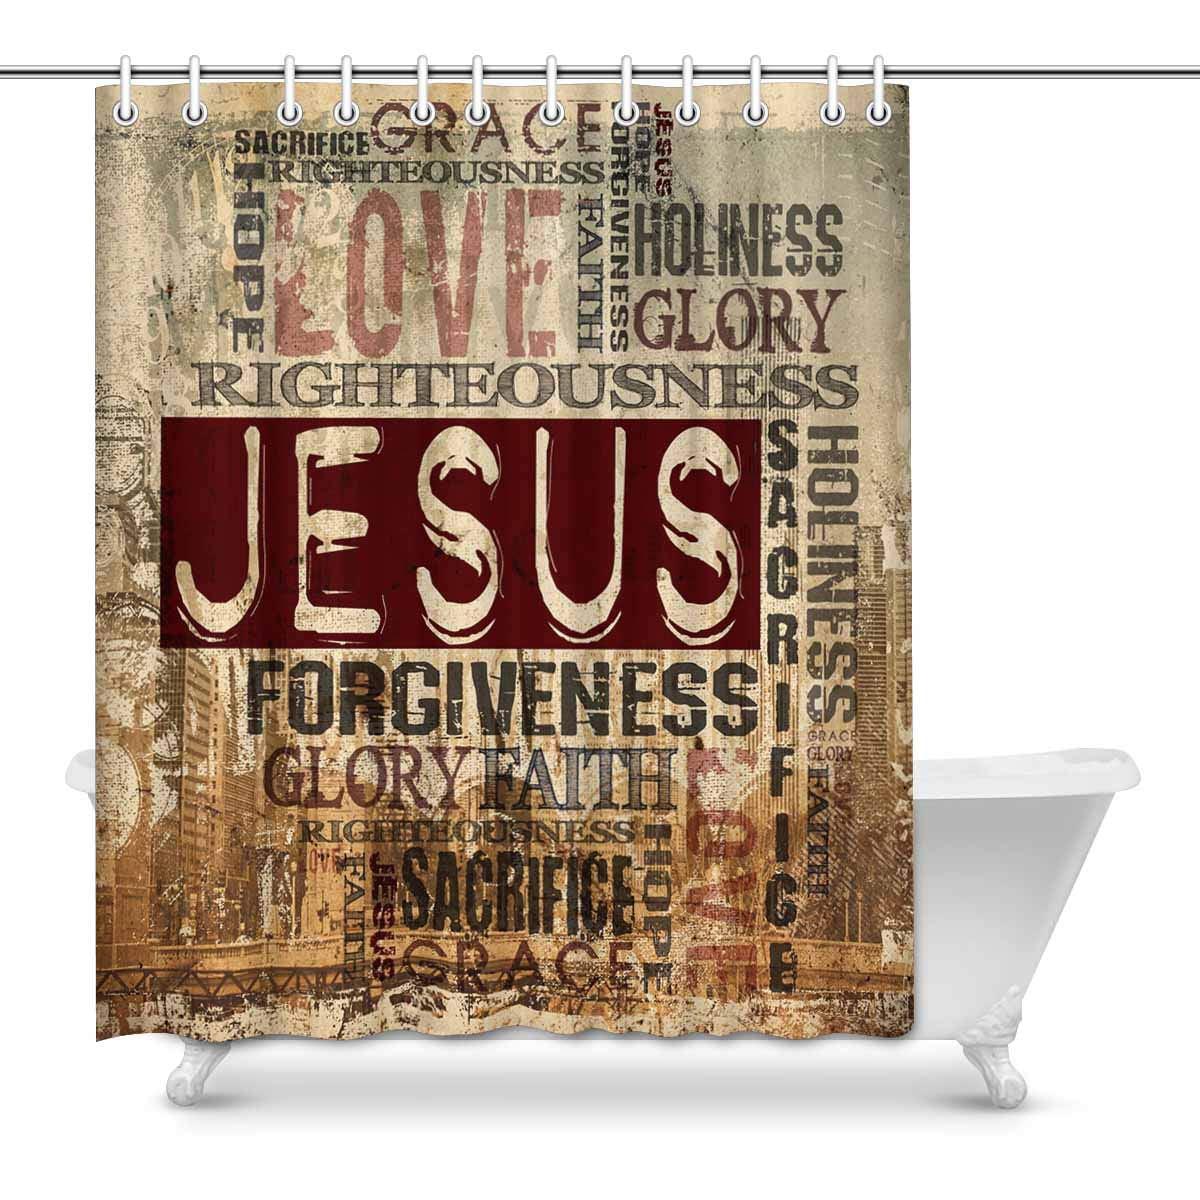 mkhert christian religious bible verse words decor waterproof polyester bathroom shower curtain bath decorations hooks 60x72 inch